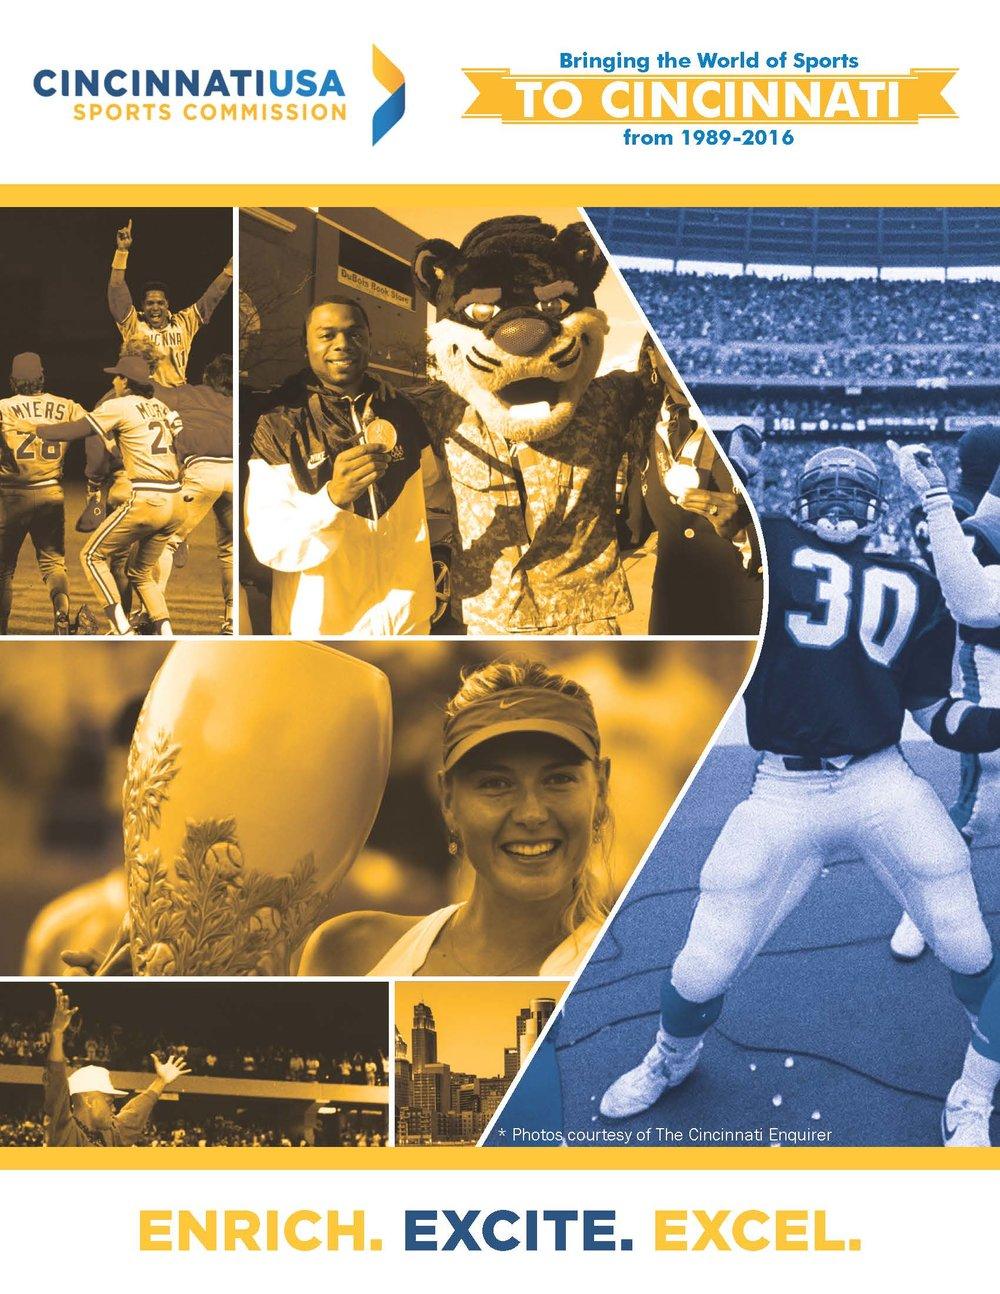 2016 CUSC anniversary brochure - WEB_Page_1.jpg